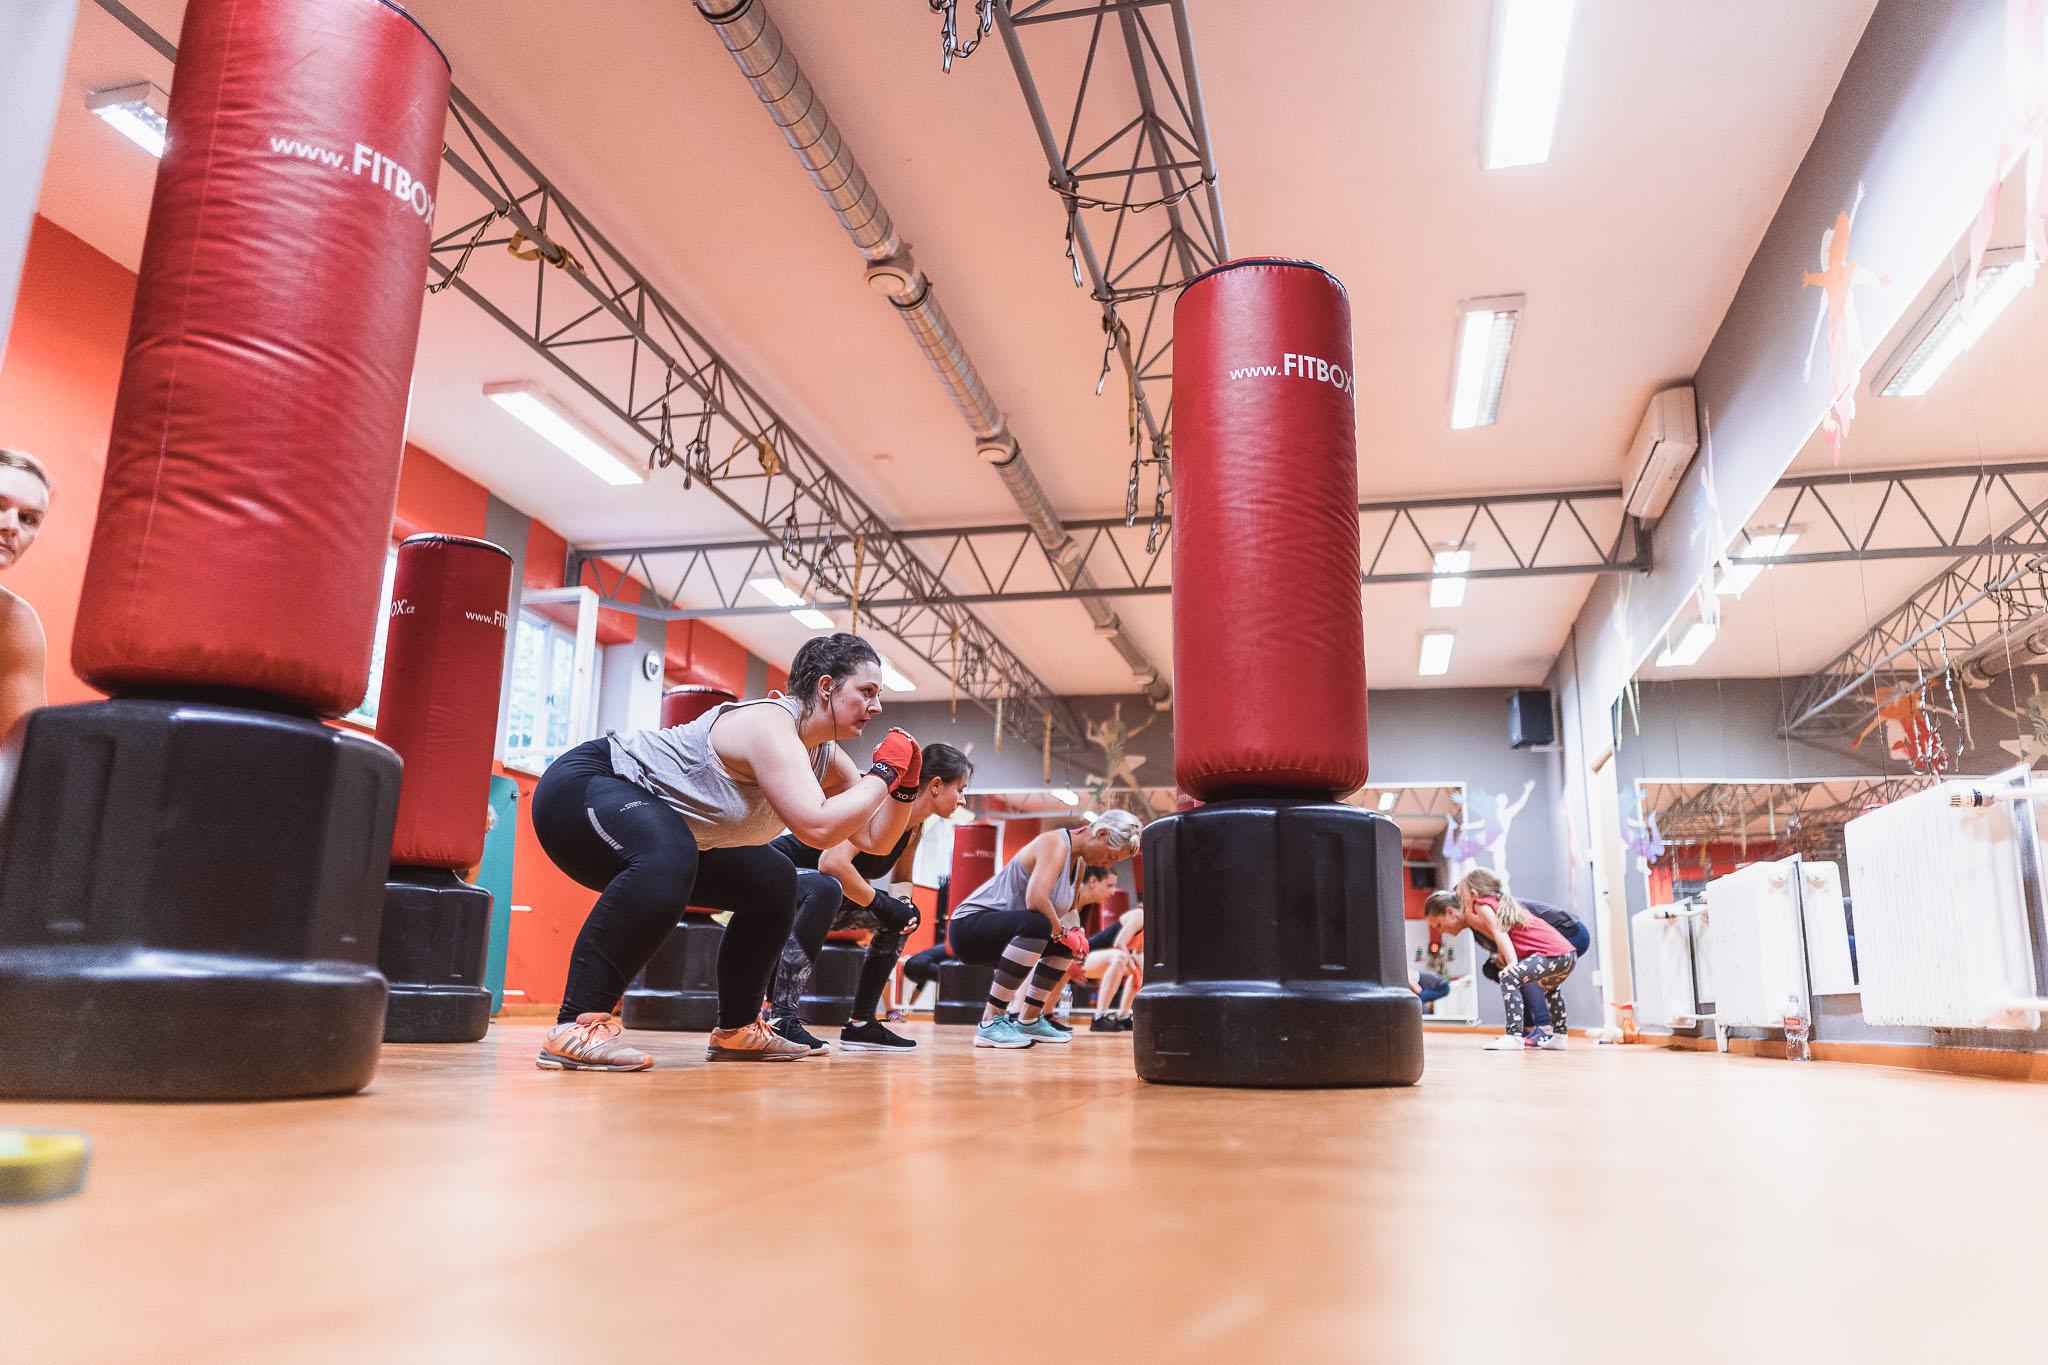 fitbox teplice next studio fitness centrum